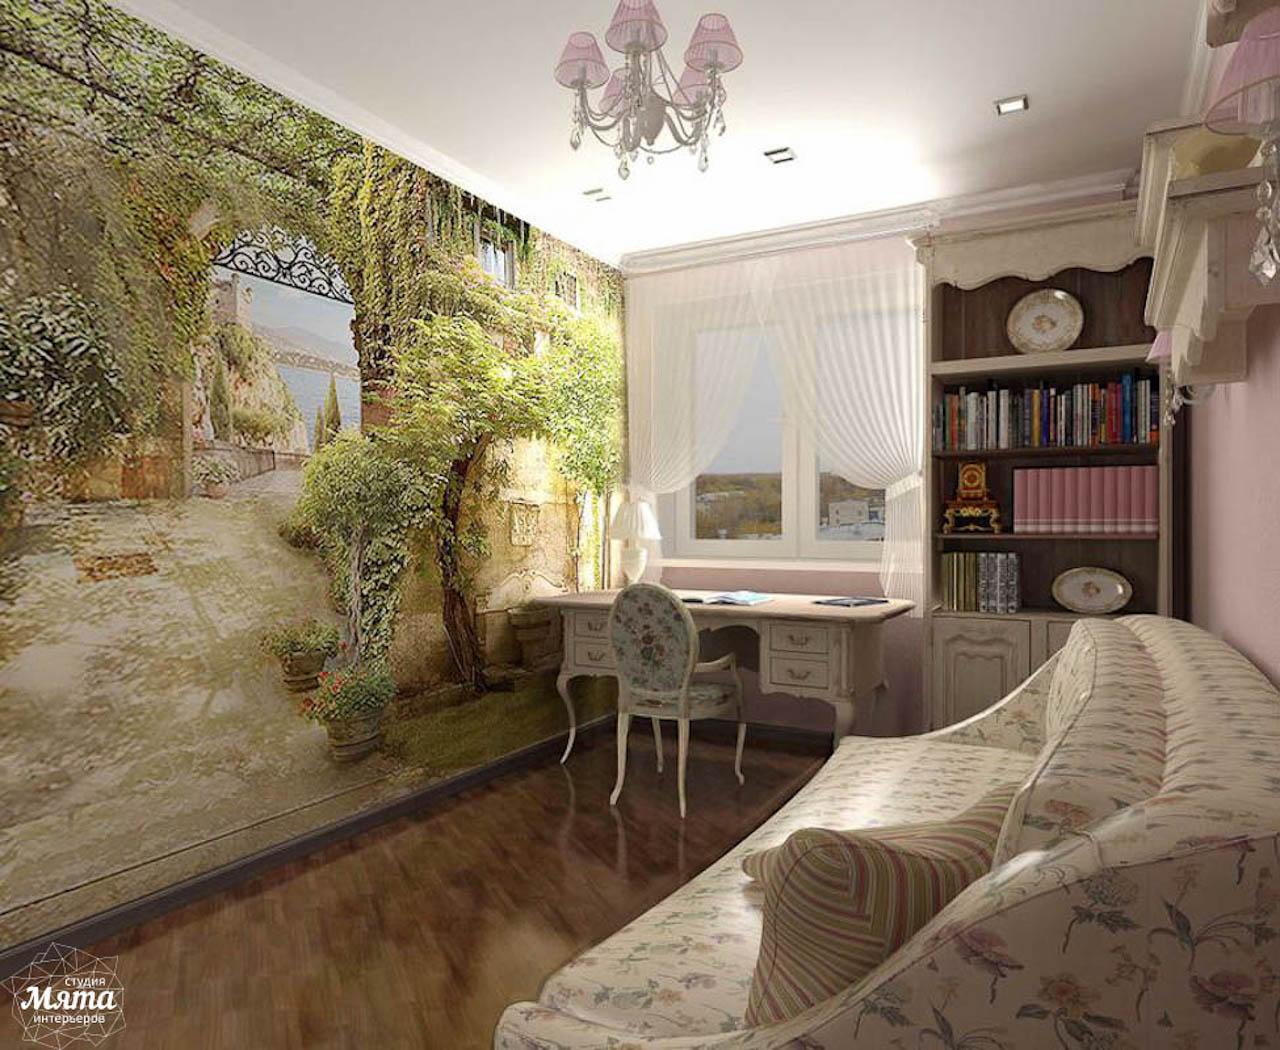 Дизайн интерьера двухкомнатной квартиры по ул. Юмашева 10 img857718021